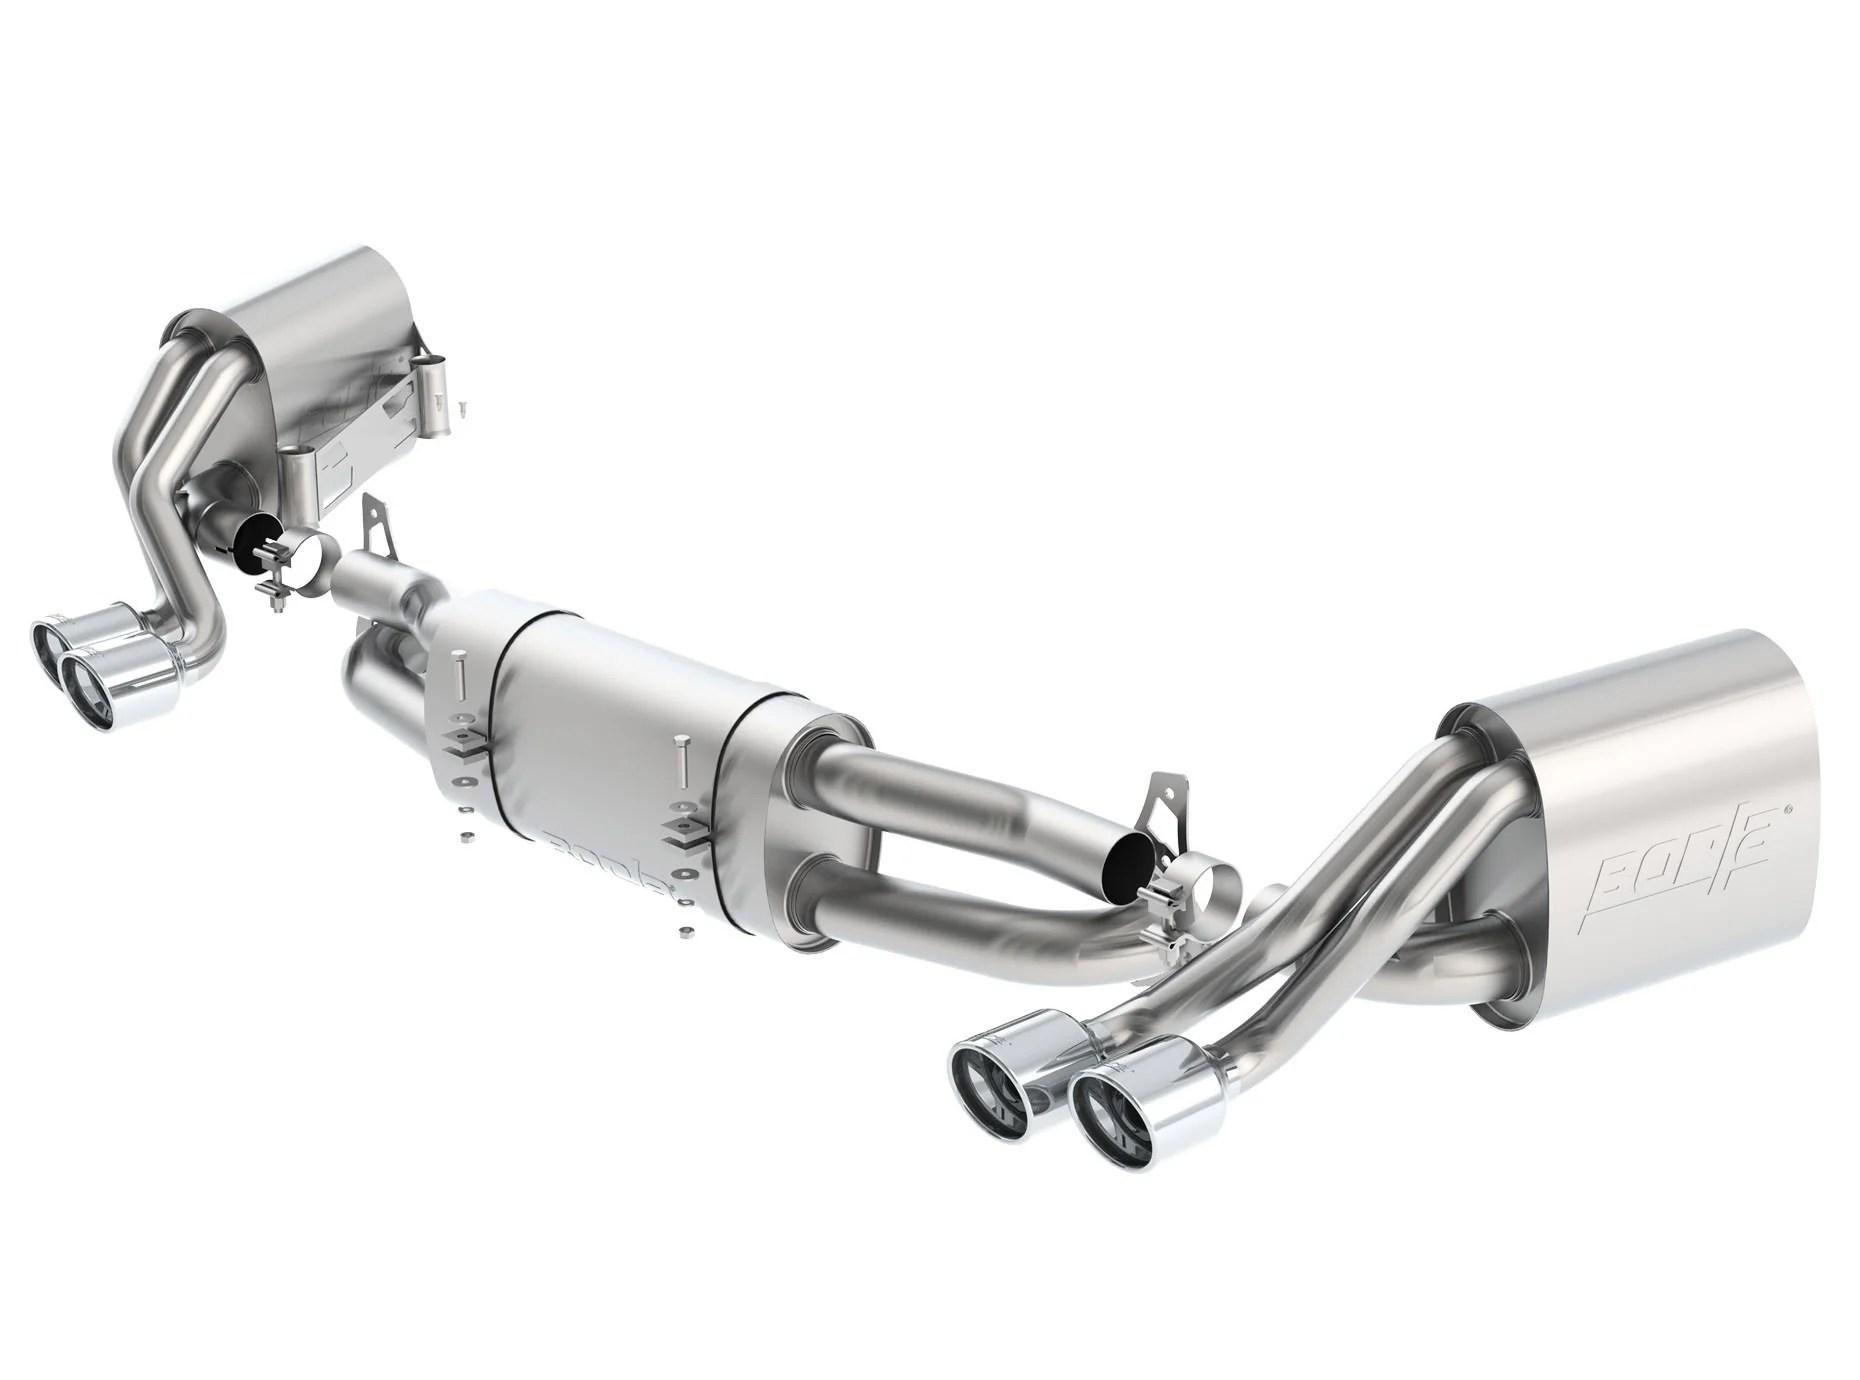 borla s type catback exhaust system 991 1 carrera